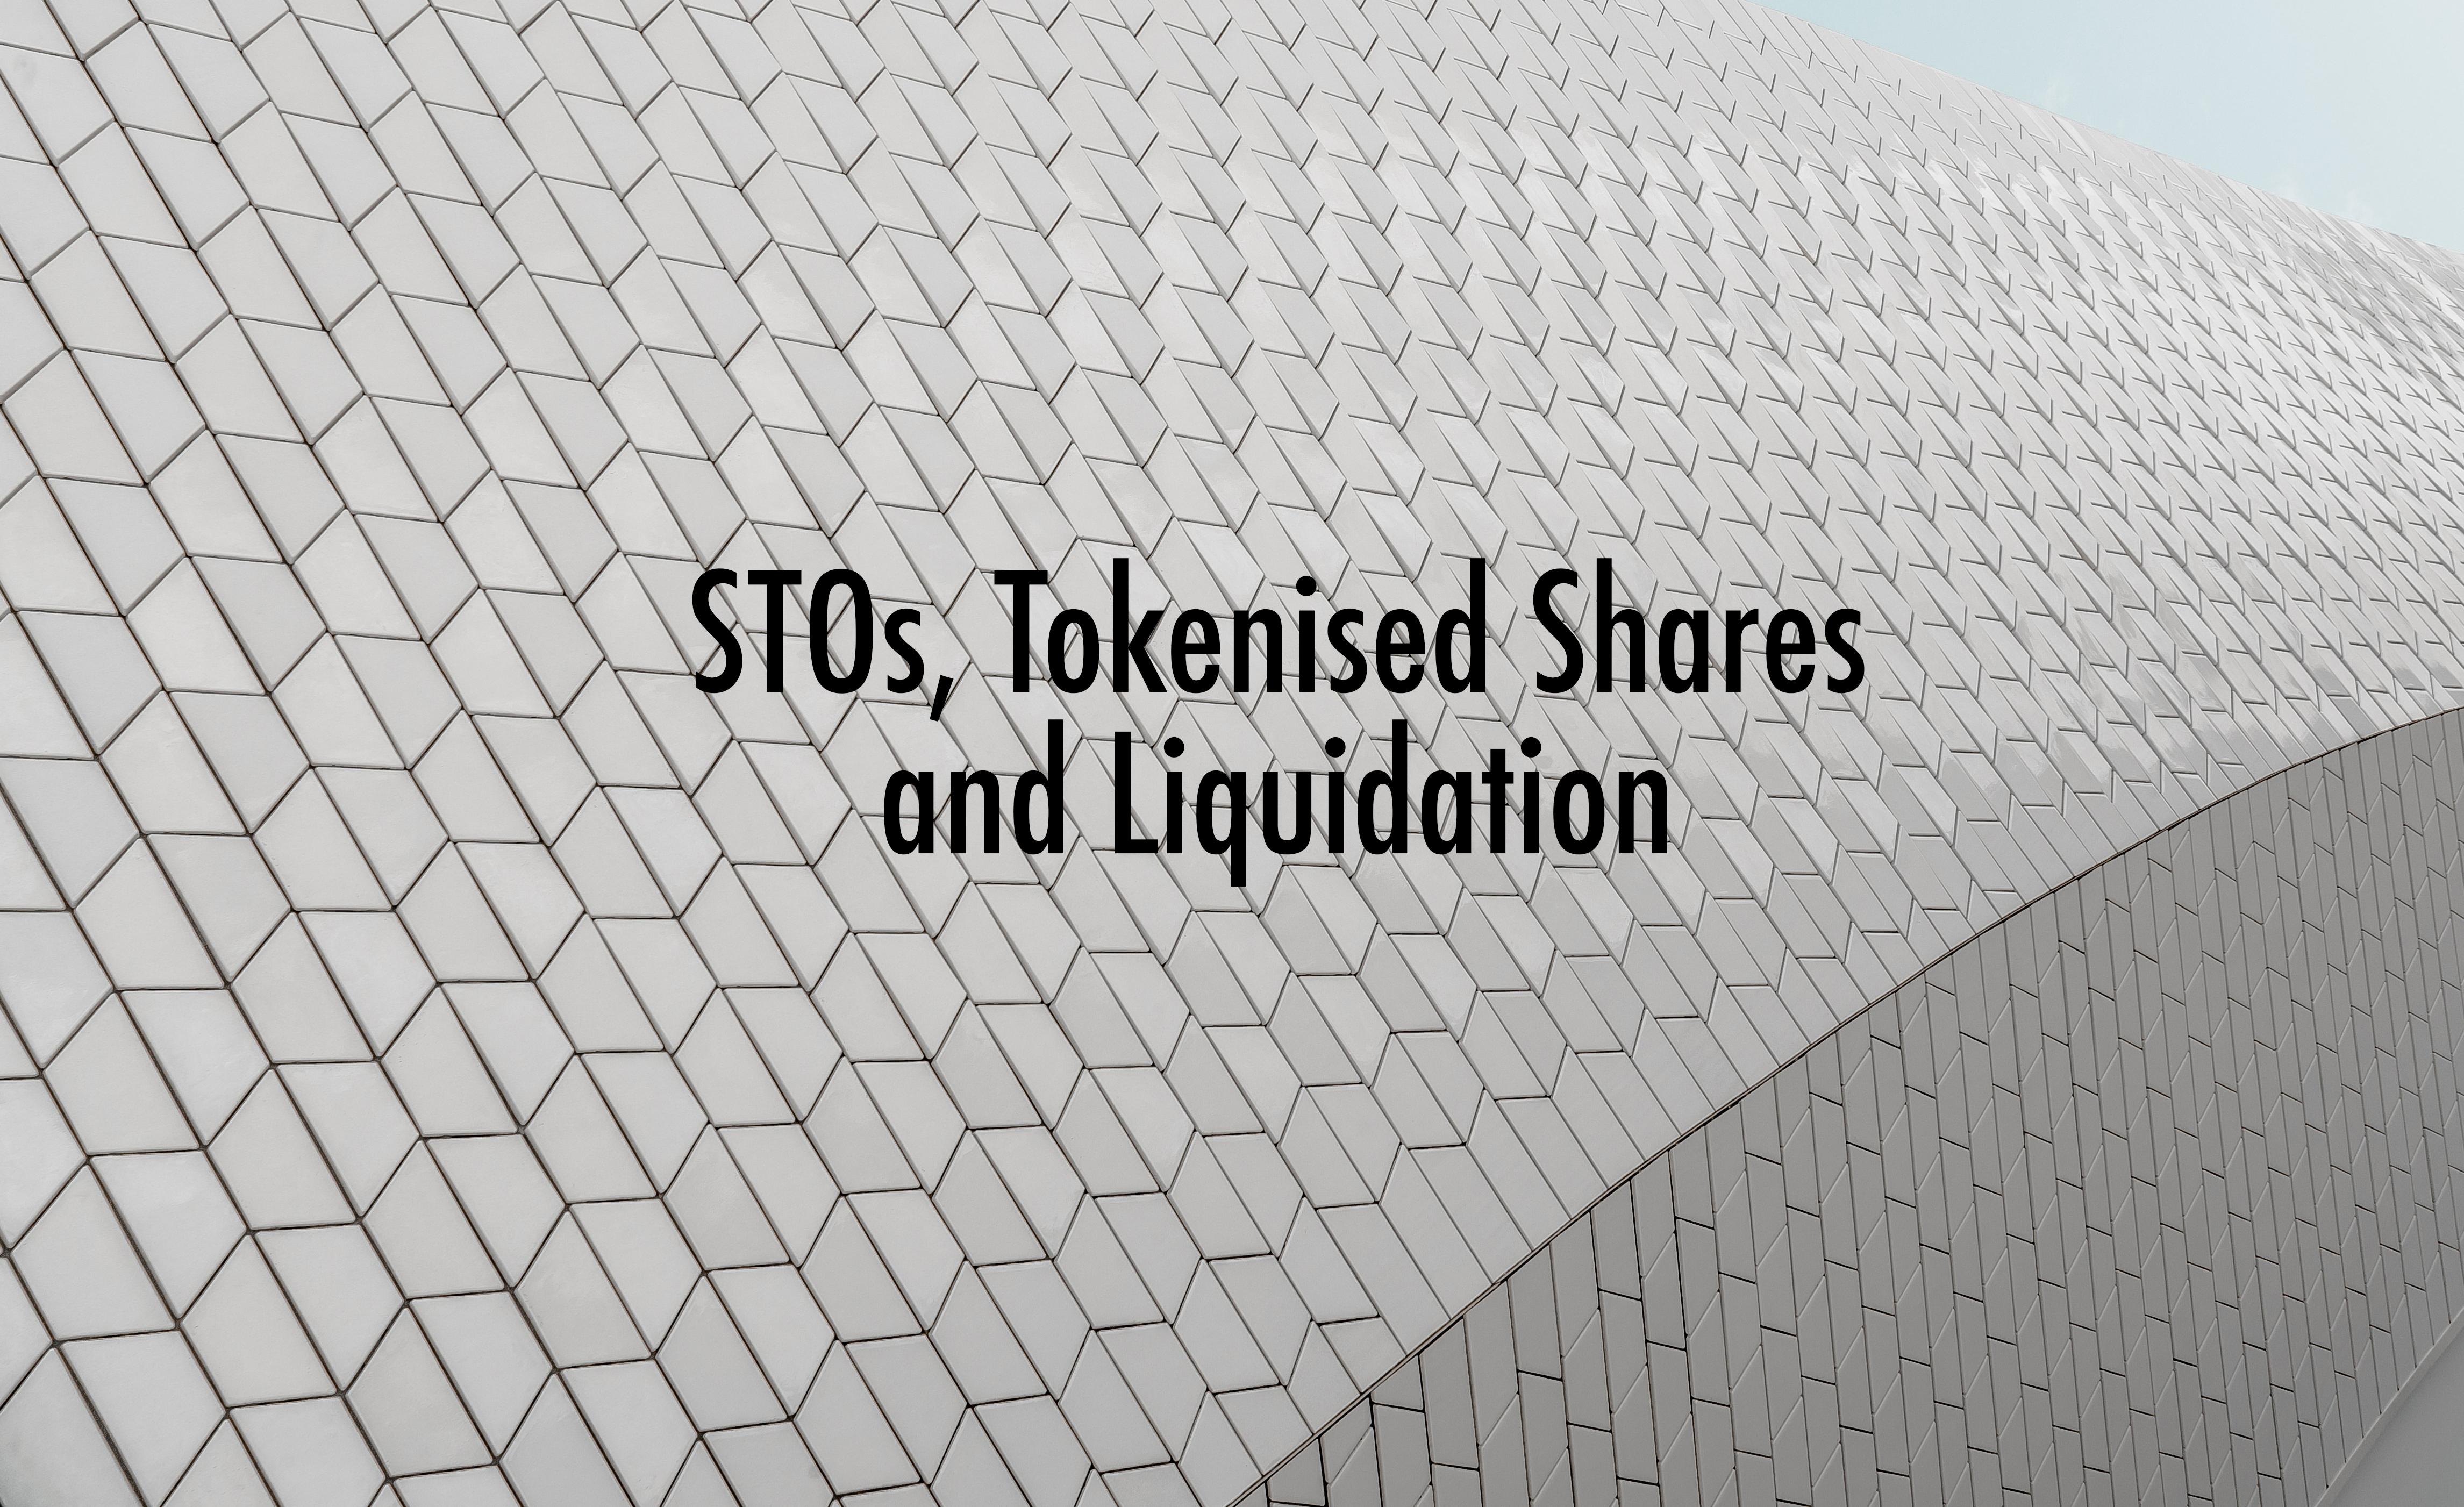 STOs, tokenized shares and liquidation